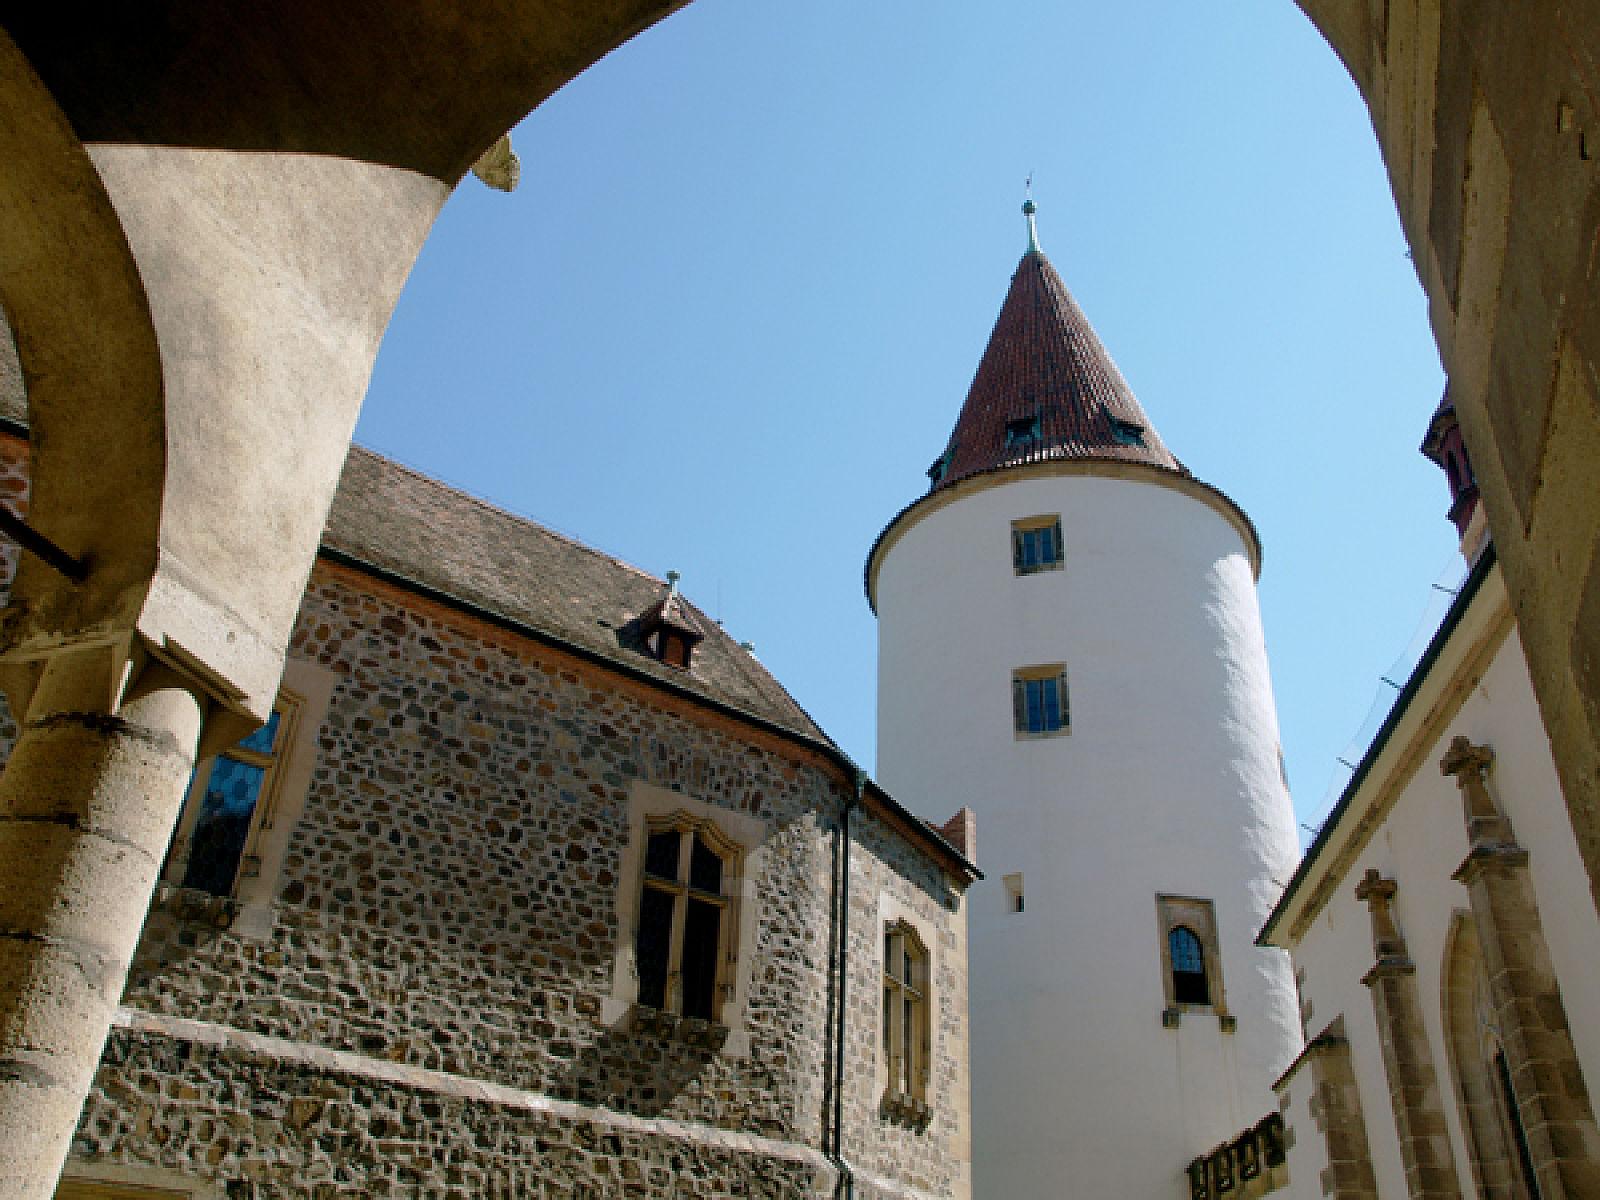 Замок Кршивоклат (Krivoklat)